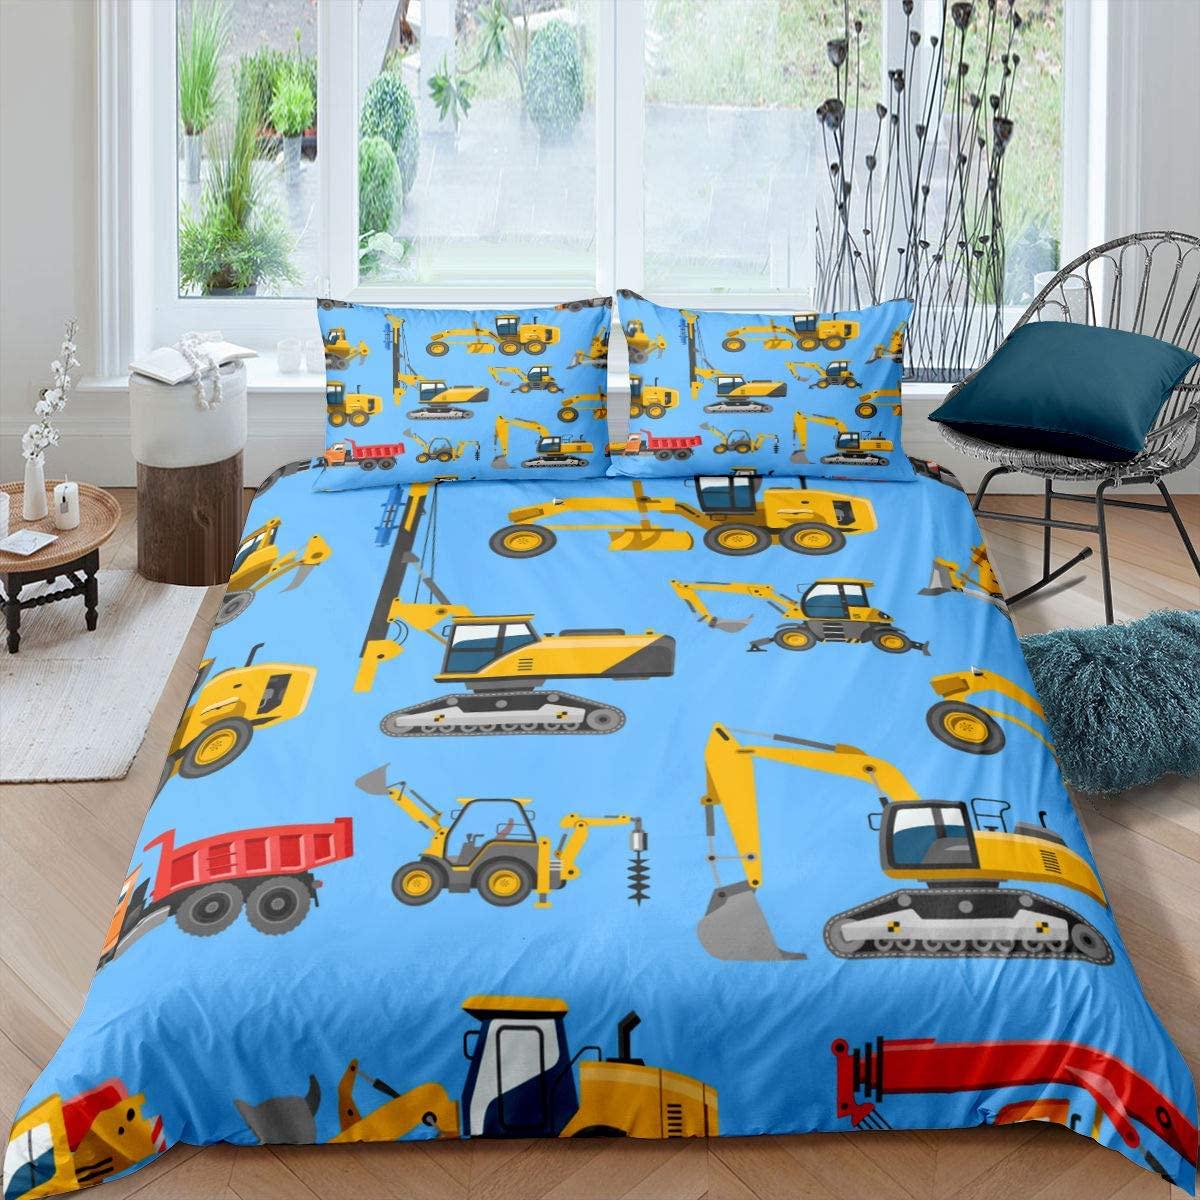 Erosebridal Construction Tractor Duvet Cover, Excavators Comforter Cover Queen Size, Crane Bedding Set, Equipment Trucks Vehicle Quilt Cover for Kids Boys Teens Gift Bedroom Decorative,Blue